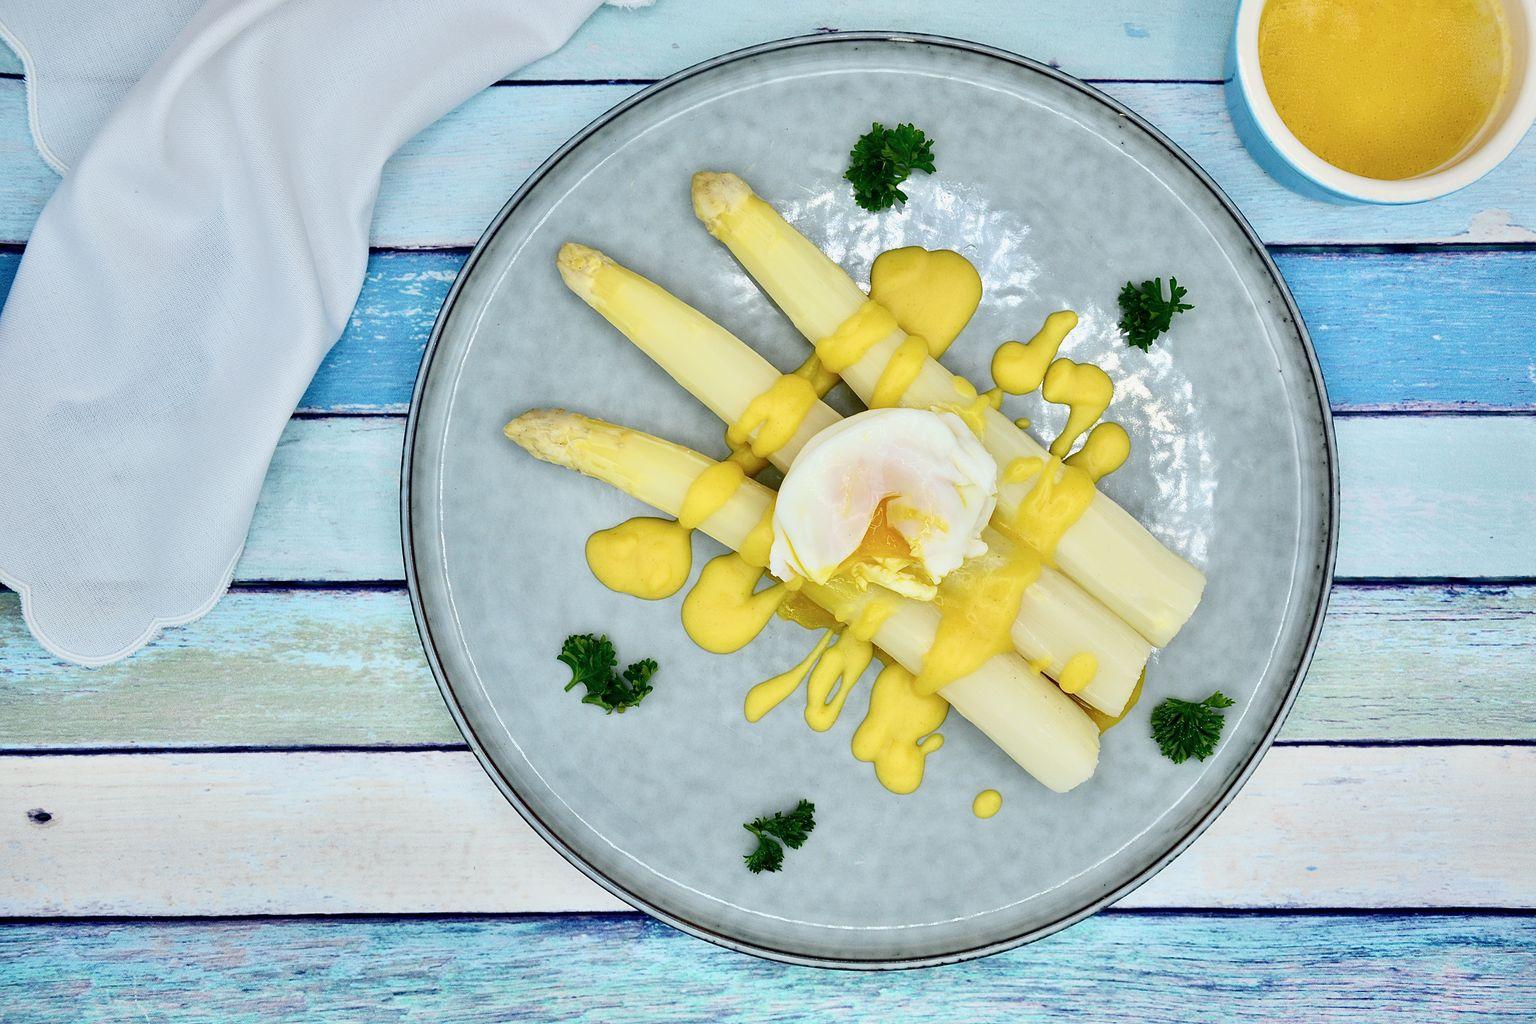 Salsify Pasta with Creamy Leek Sauce